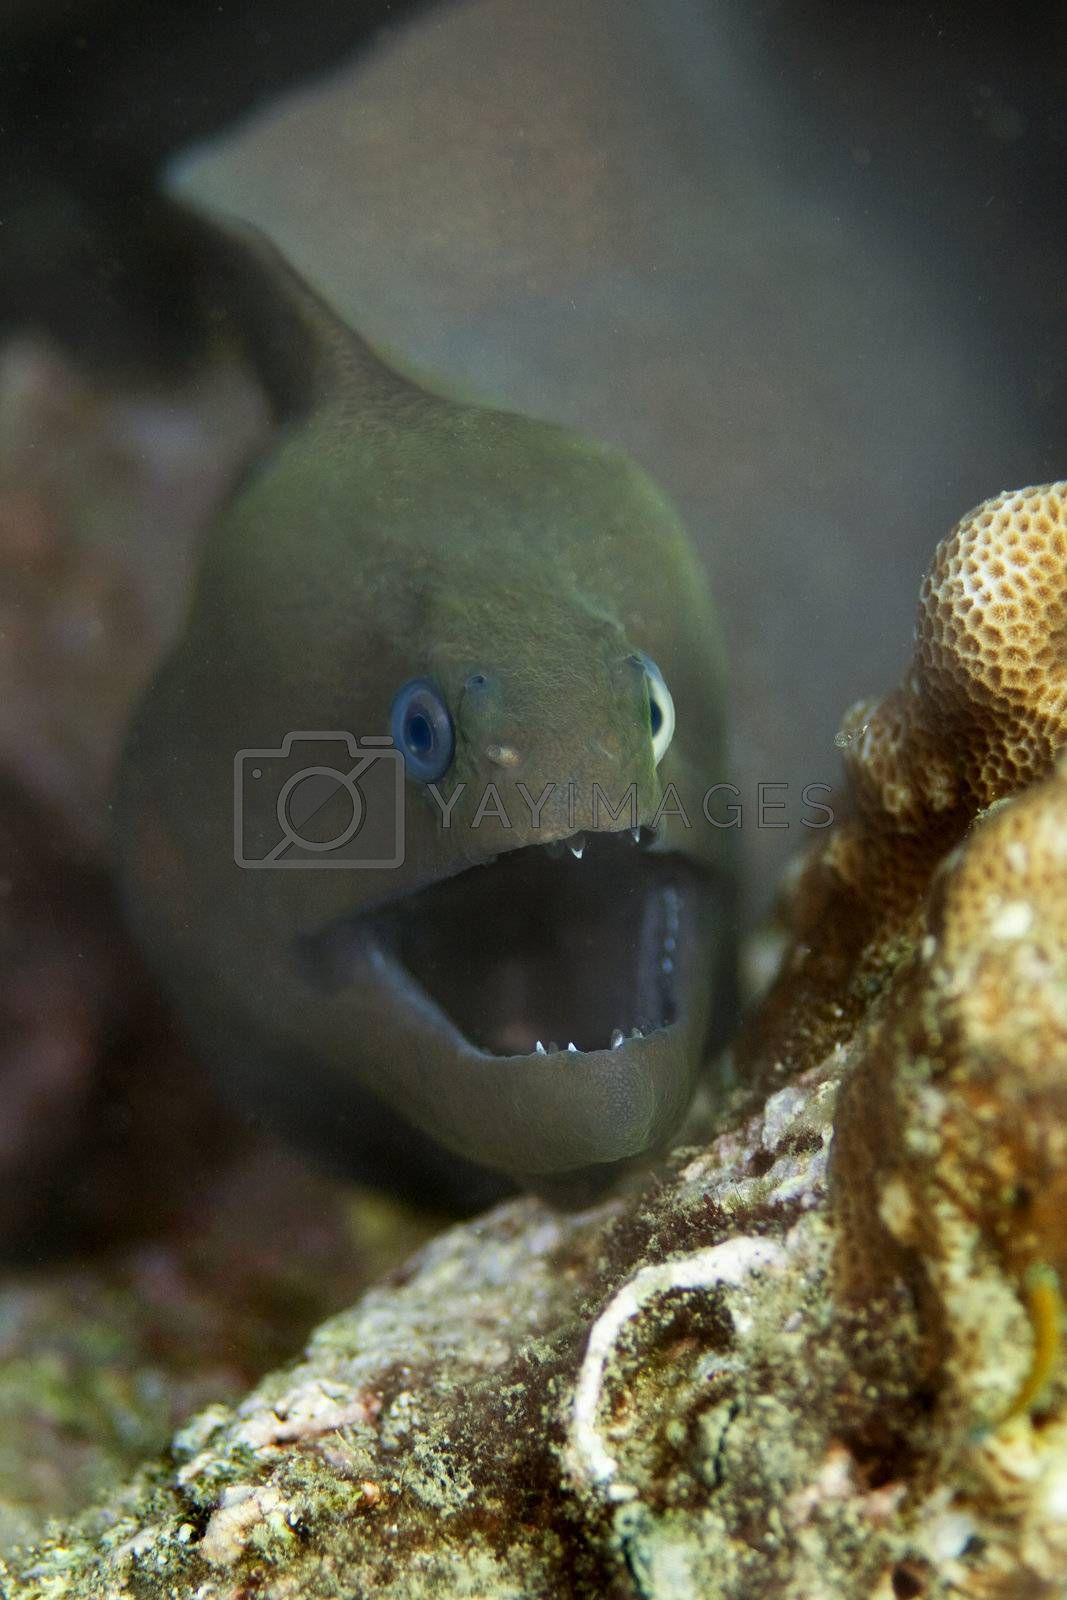 A giant moray eel at Bida Nok divesite on Phi Phi, Thailand